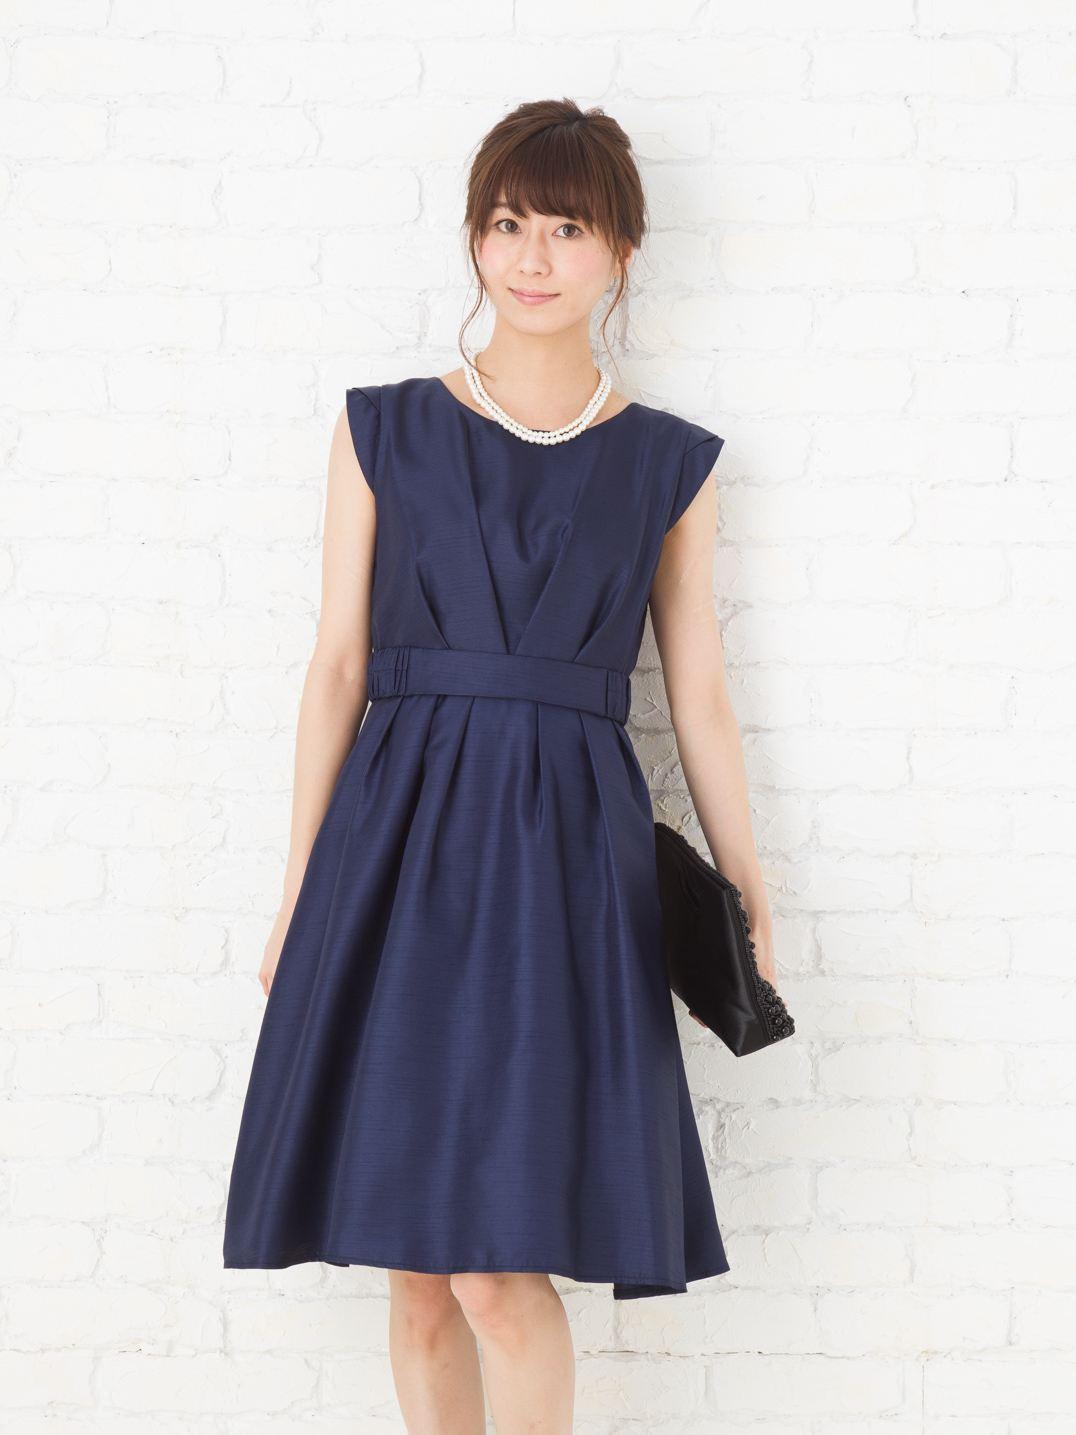 Dorry Doll ドレス / Mサイズ (DOC0053)